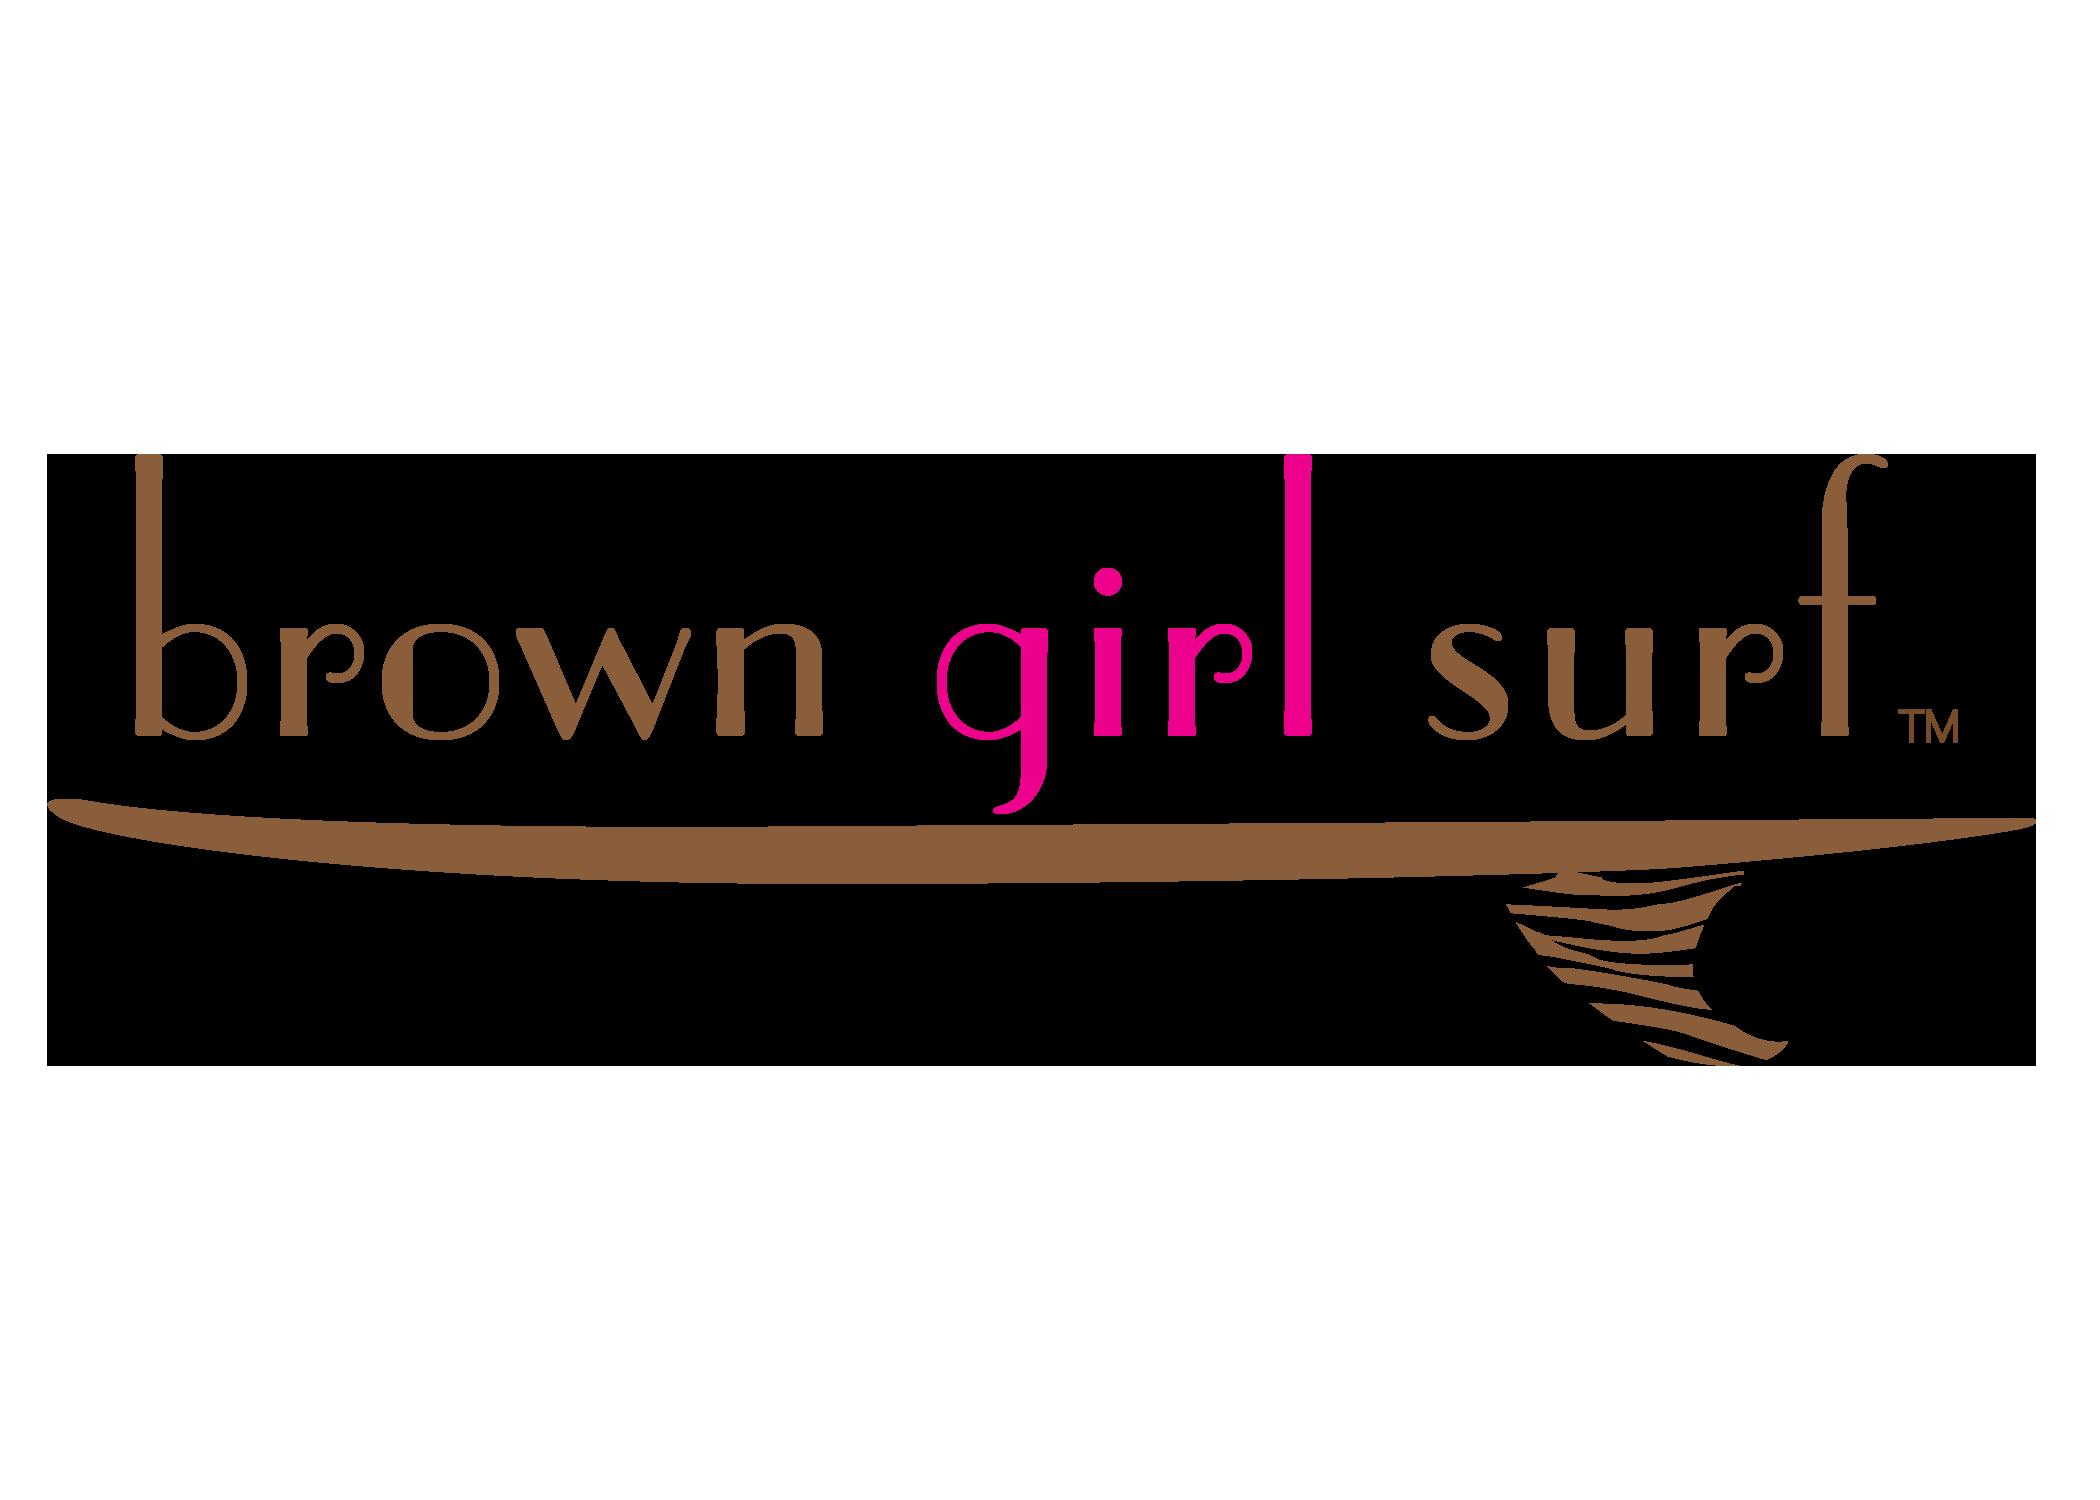 Brown Girl Surf